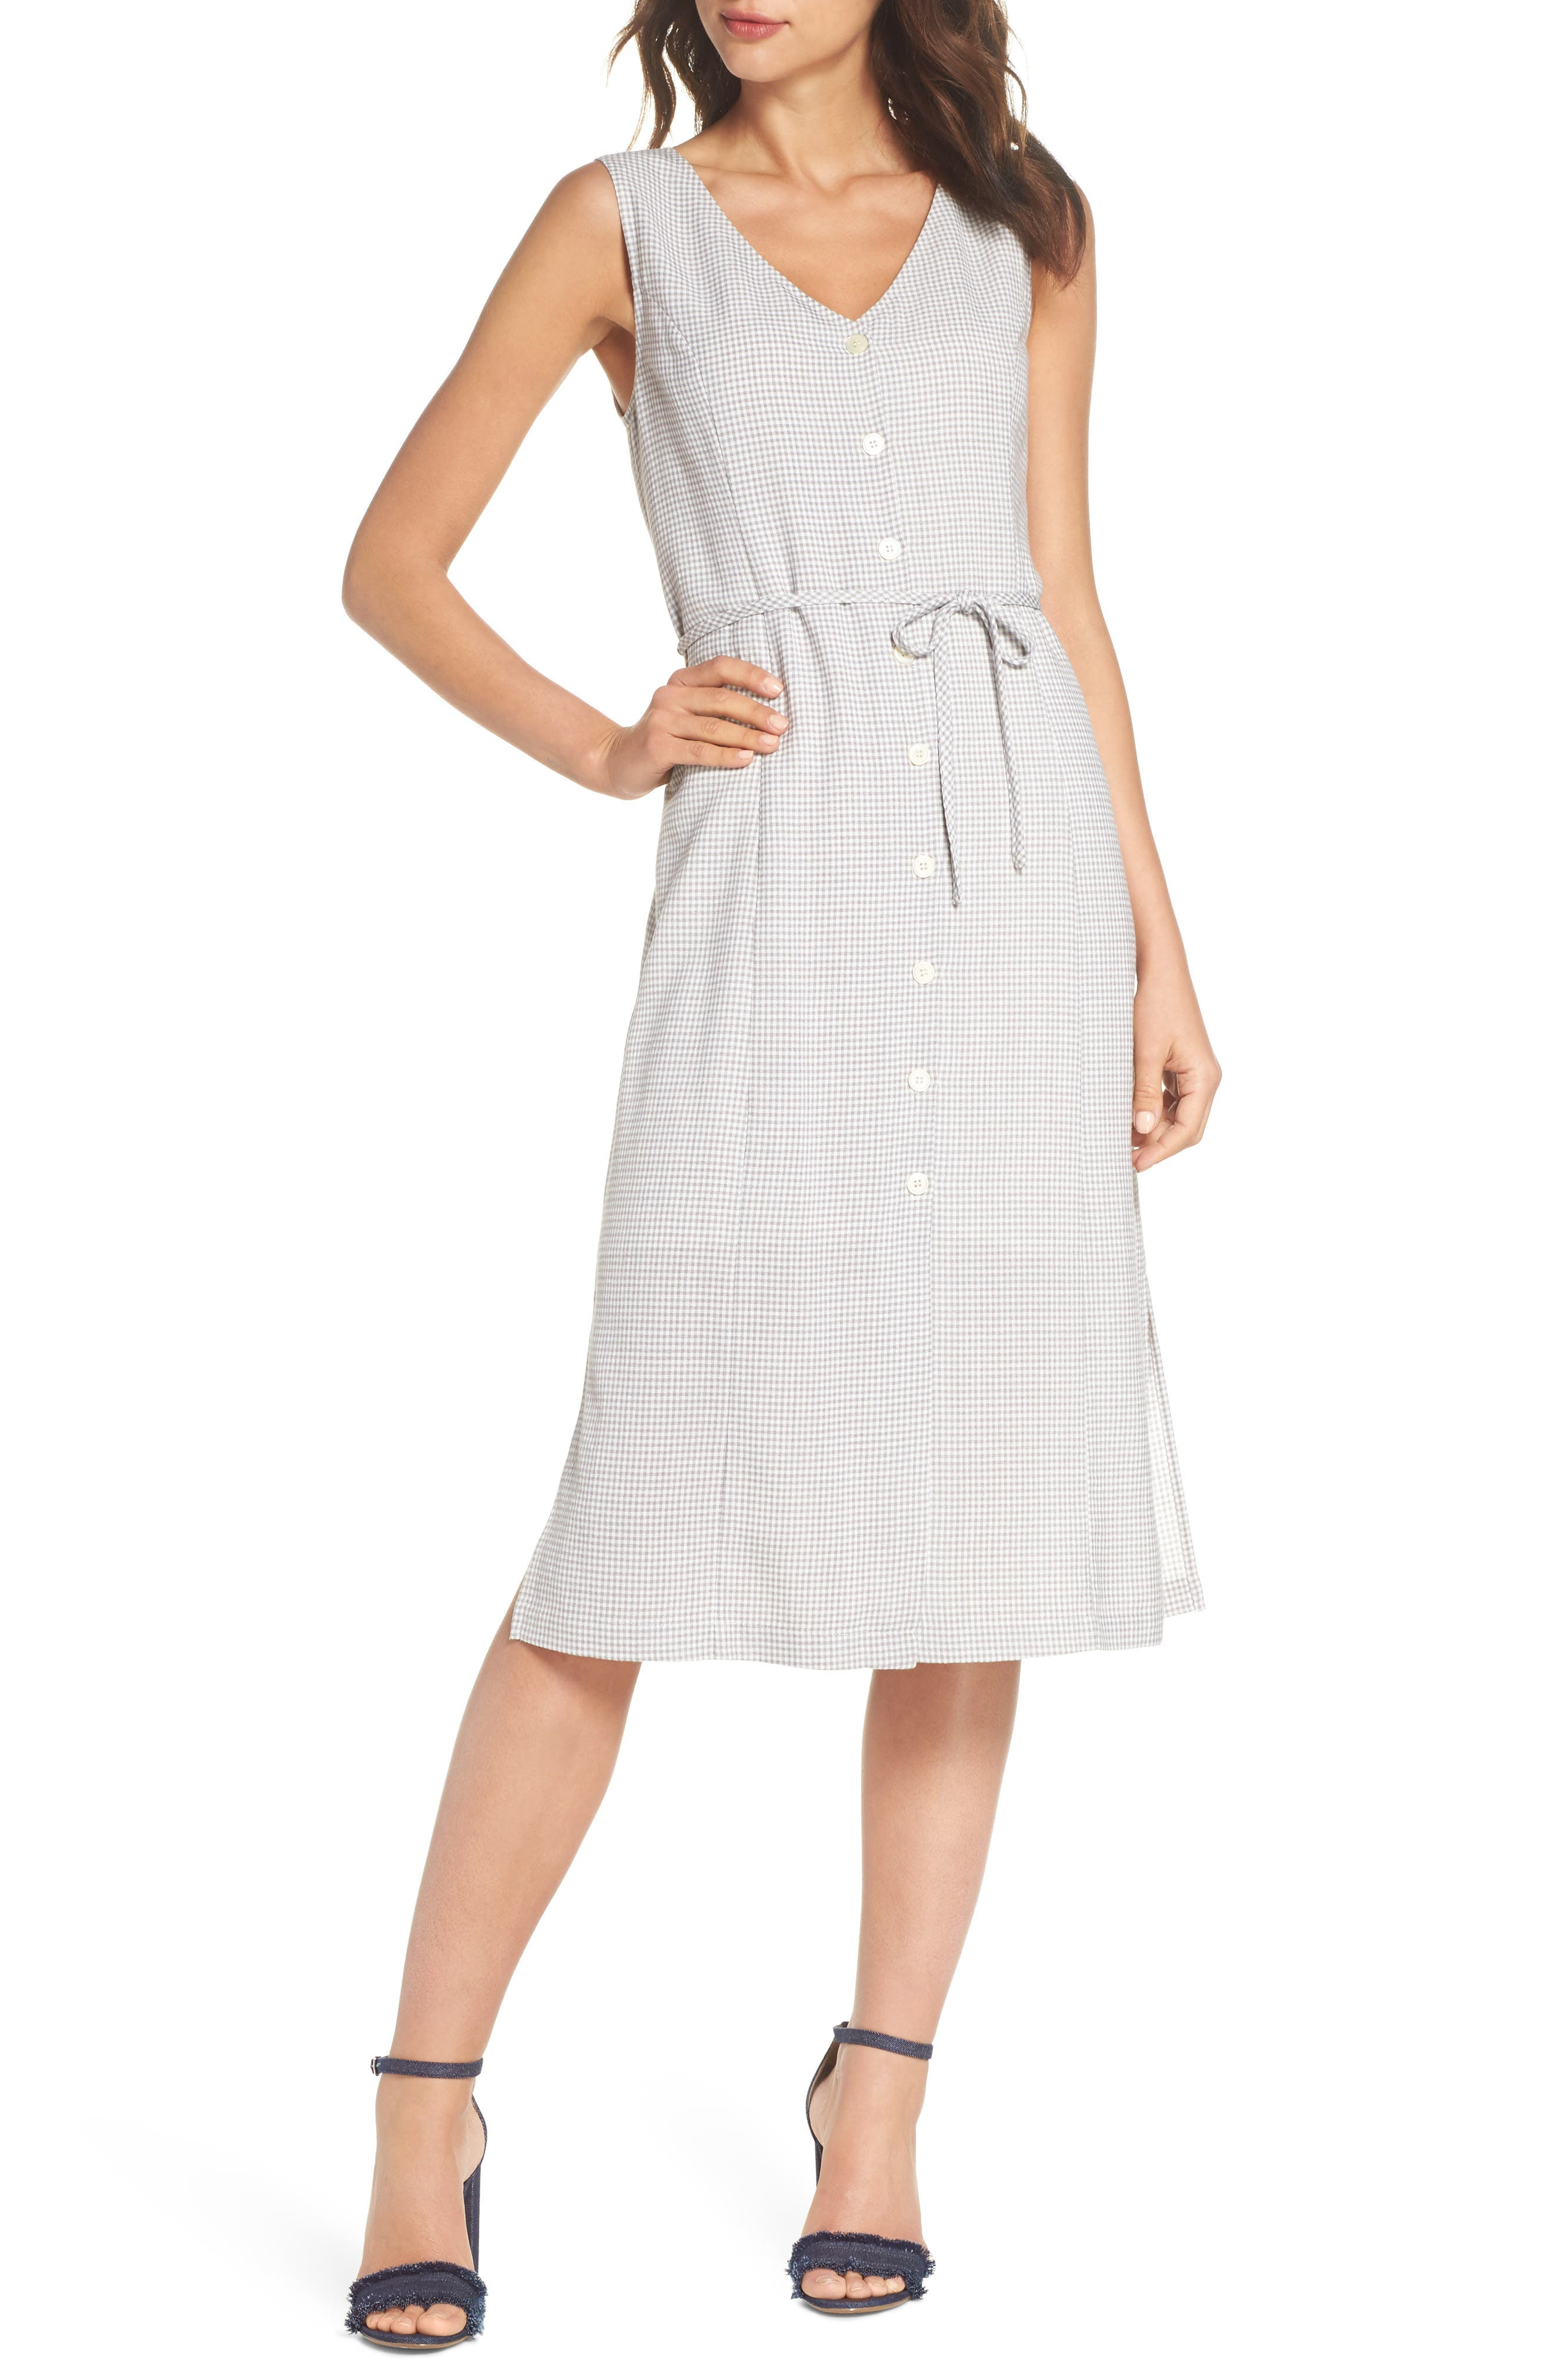 Gingham Midi Dress,                         Main,                         color, Grey/ White